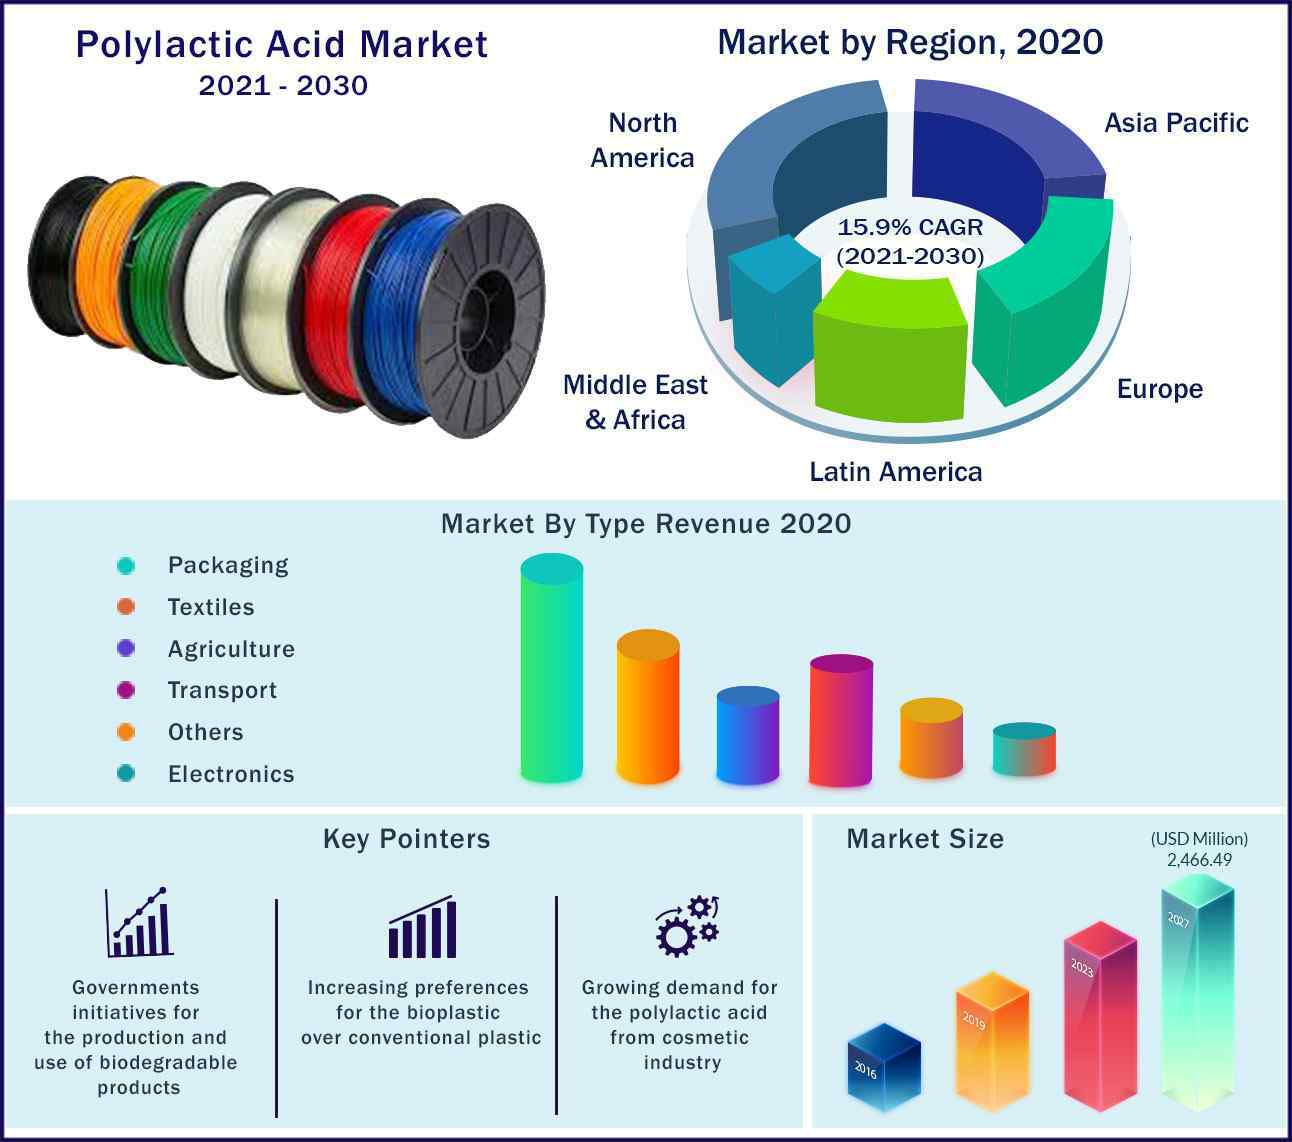 Global Polylactic Acid Market 2021-2030